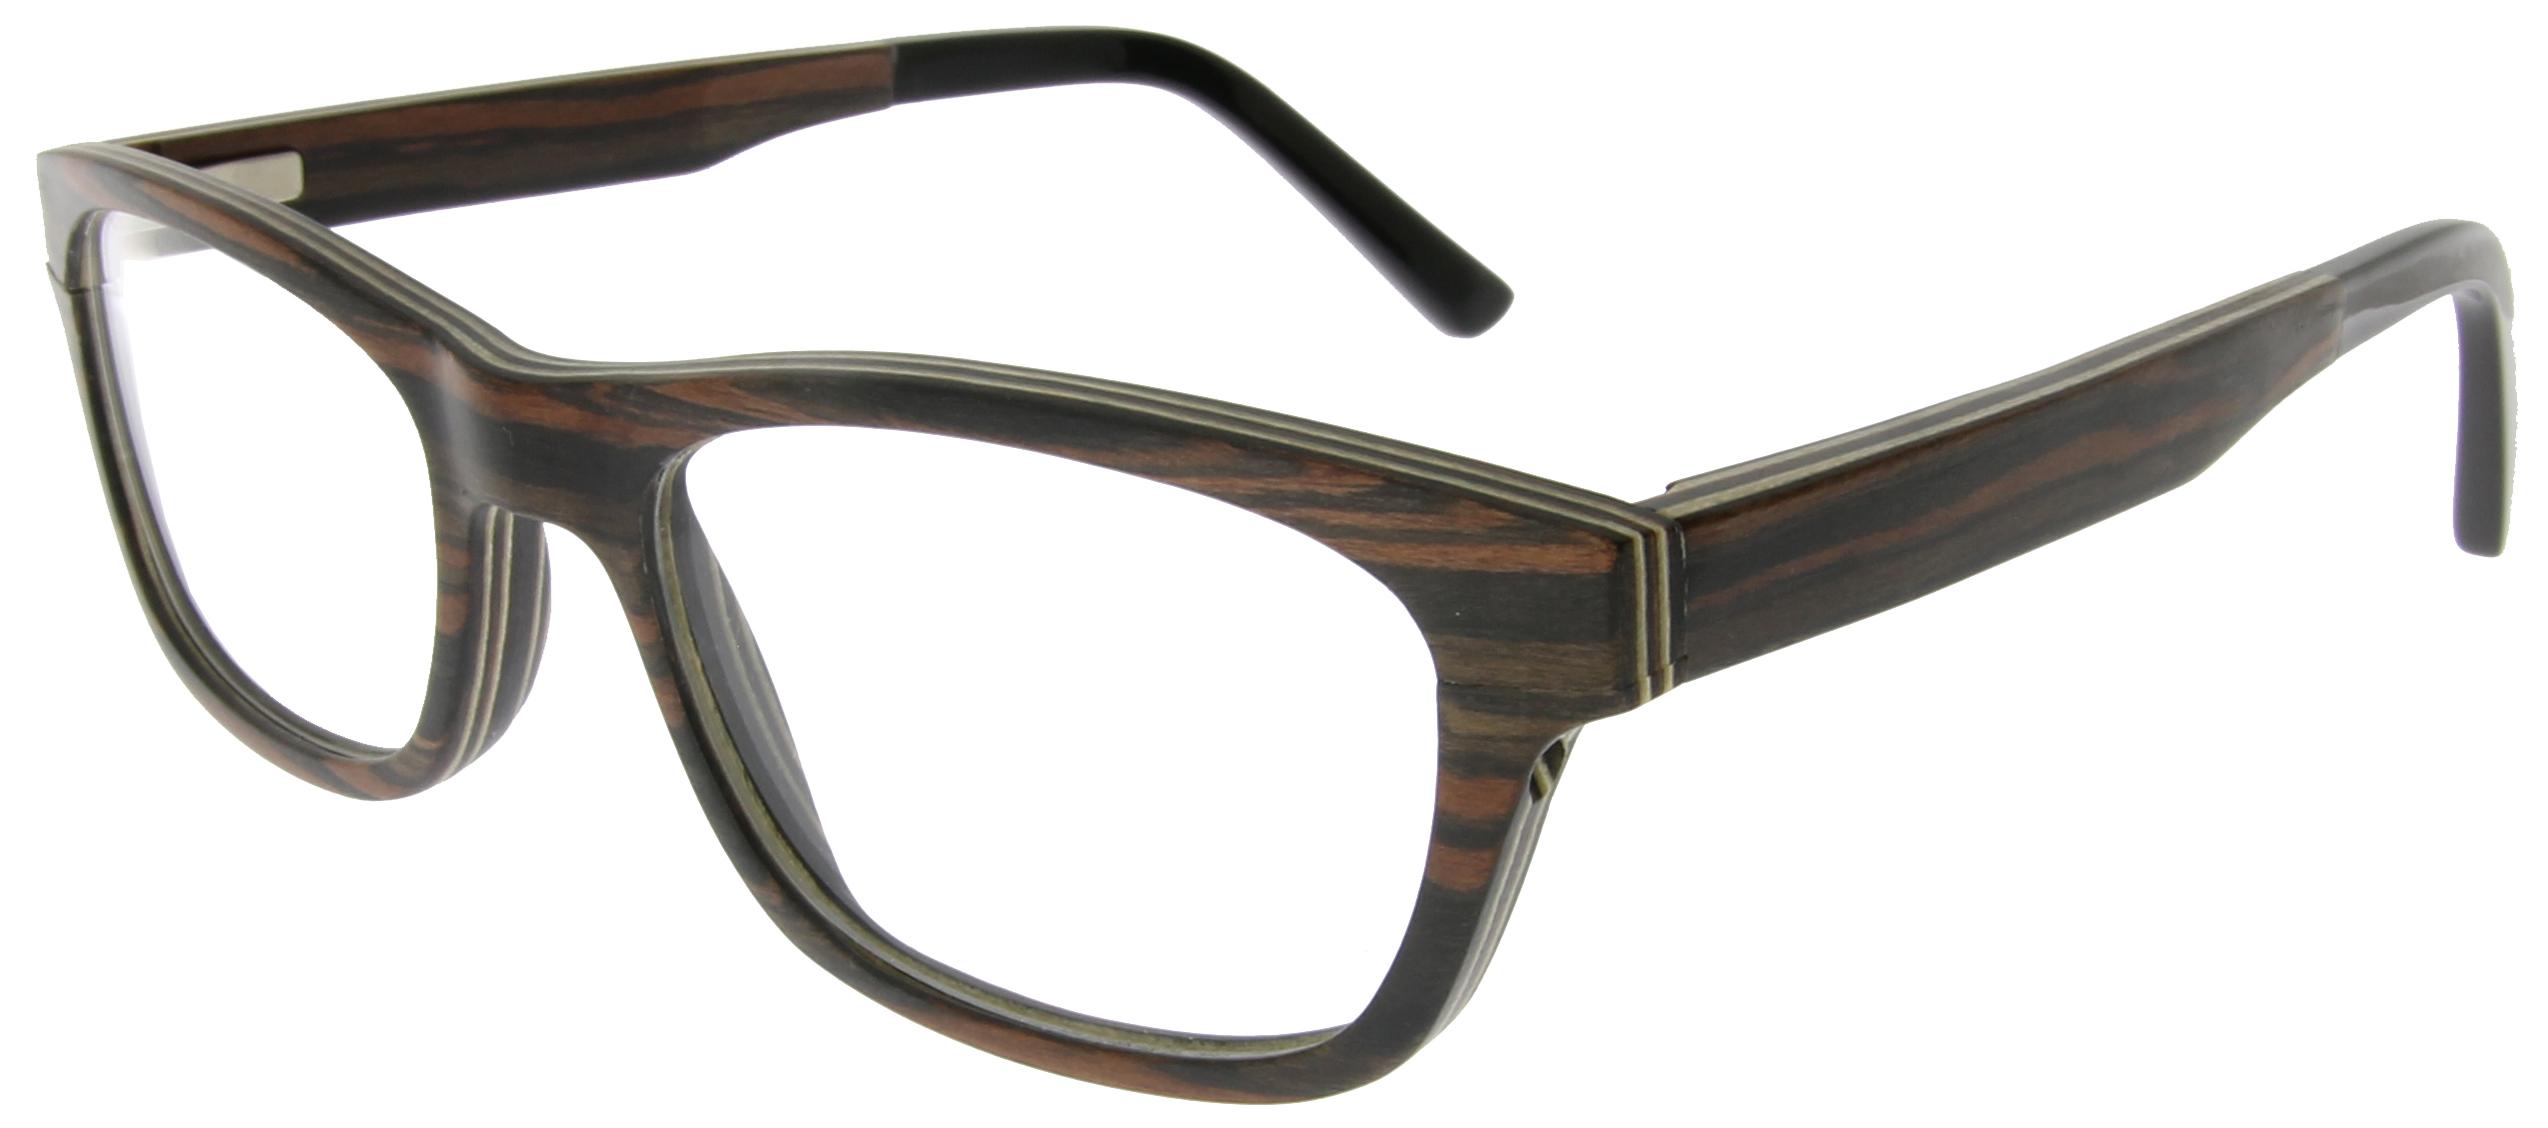 Wayfarer Brille aus rot-braunem Ebenholz